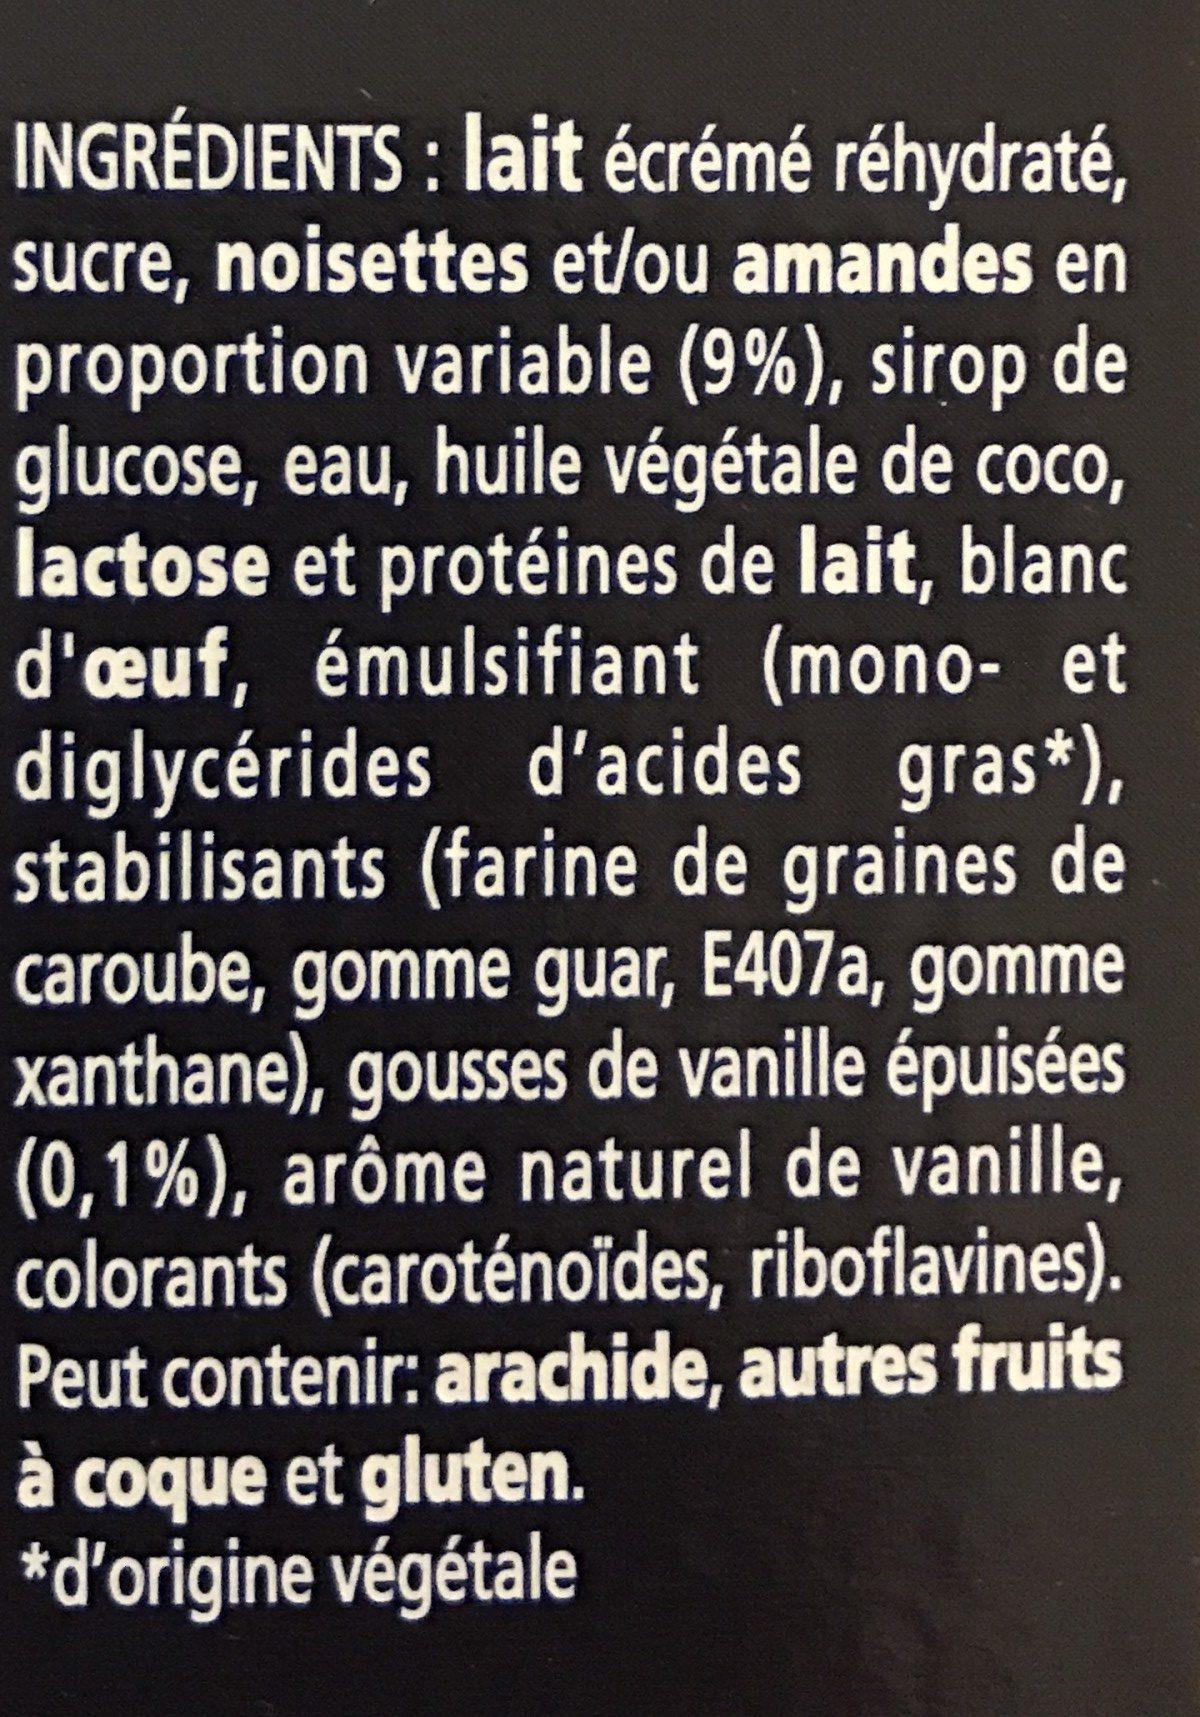 Le Mystère Original - Vanille Cœur Meringue - Ingredienti - fr